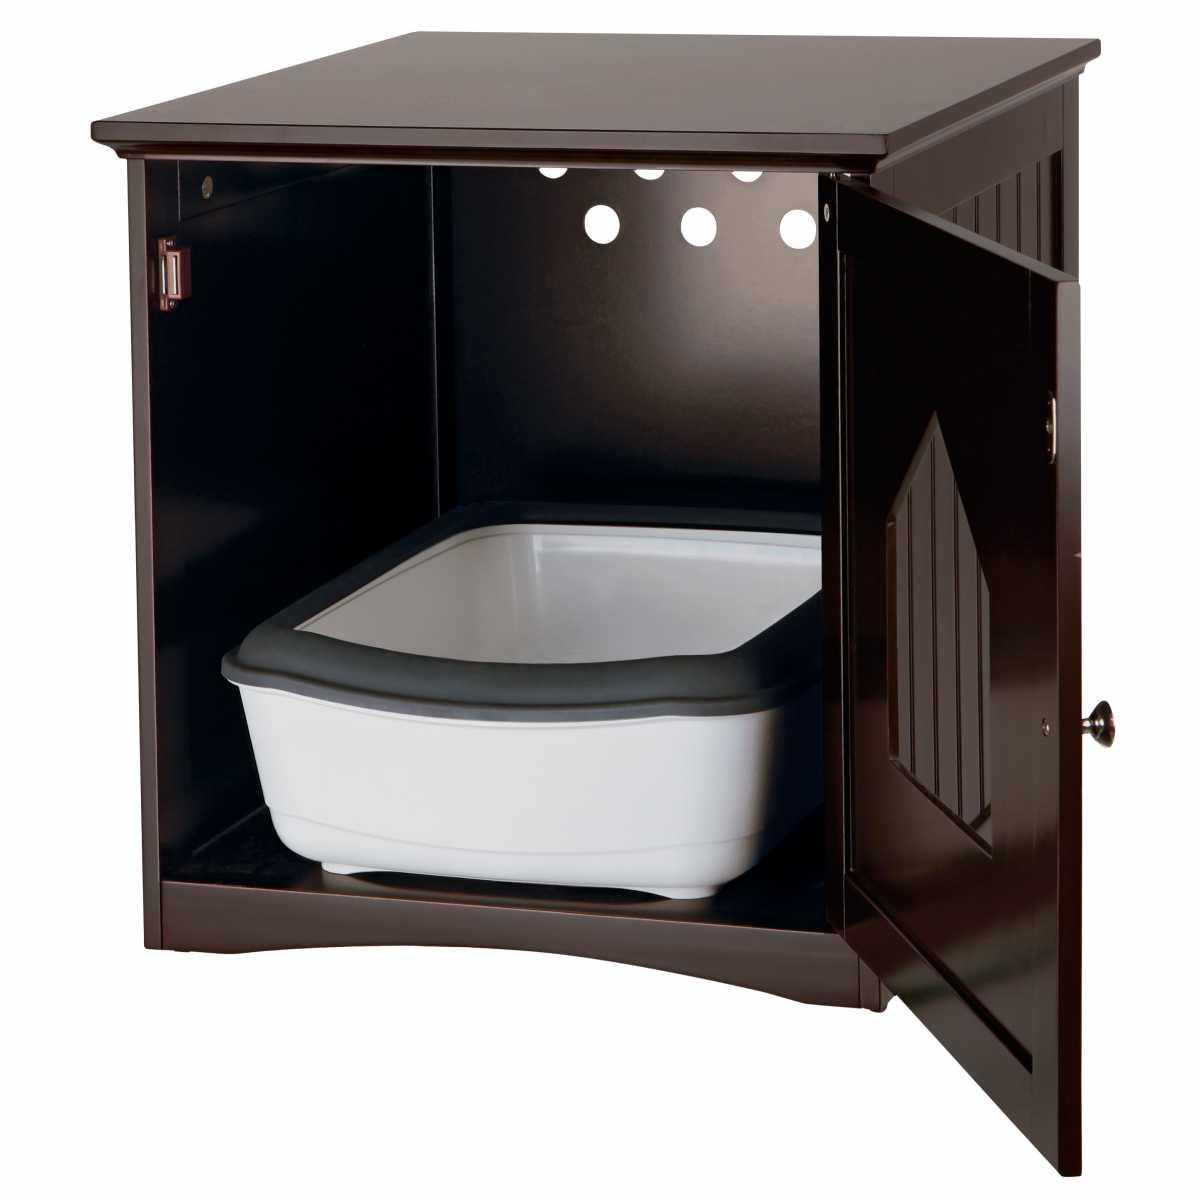 Wooden Cat Toilet Litterbox Cabinet Brown